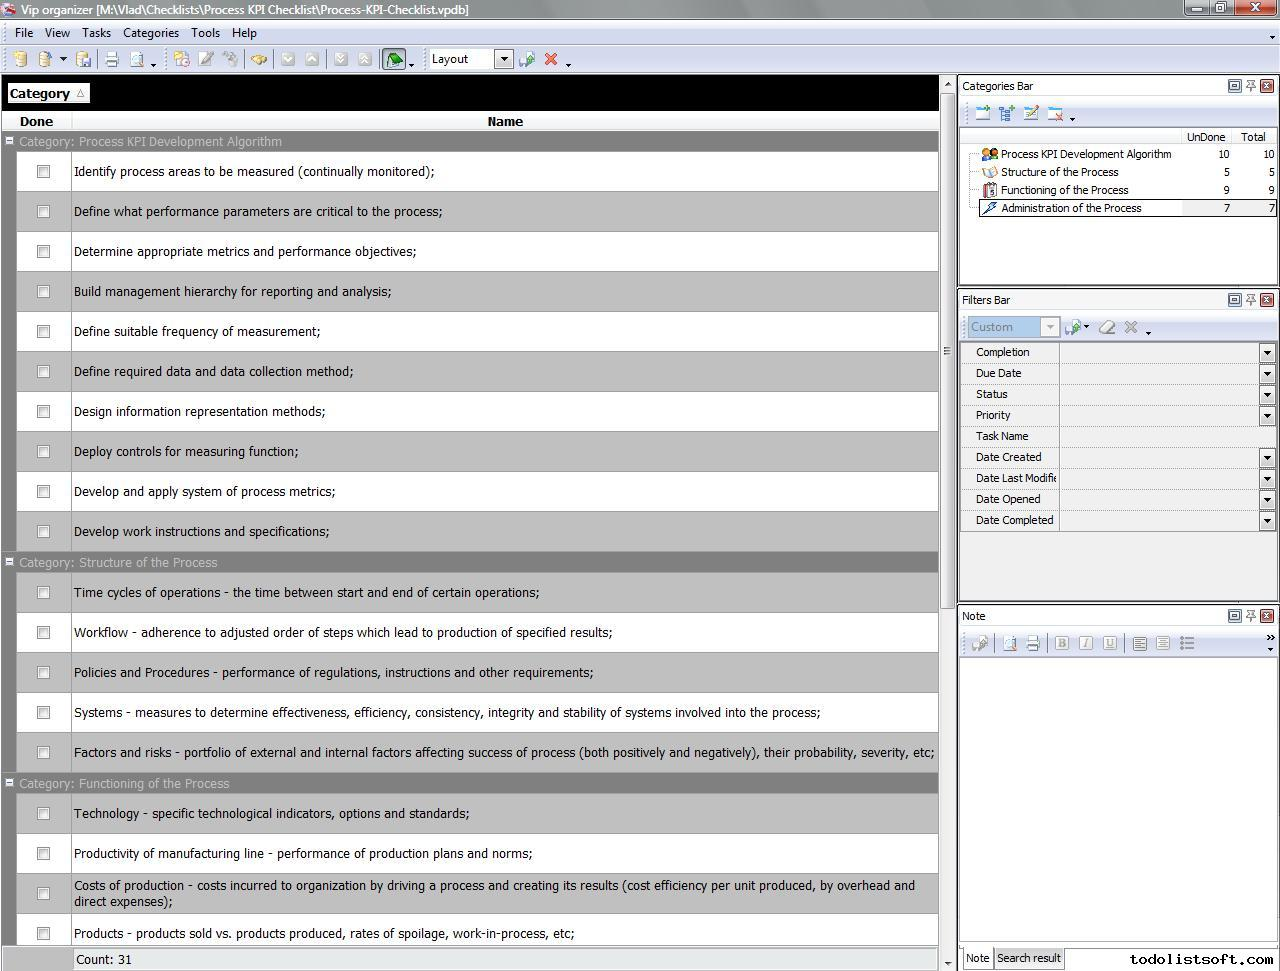 Checklist Personnel File Template Sample Form Process Management Templates